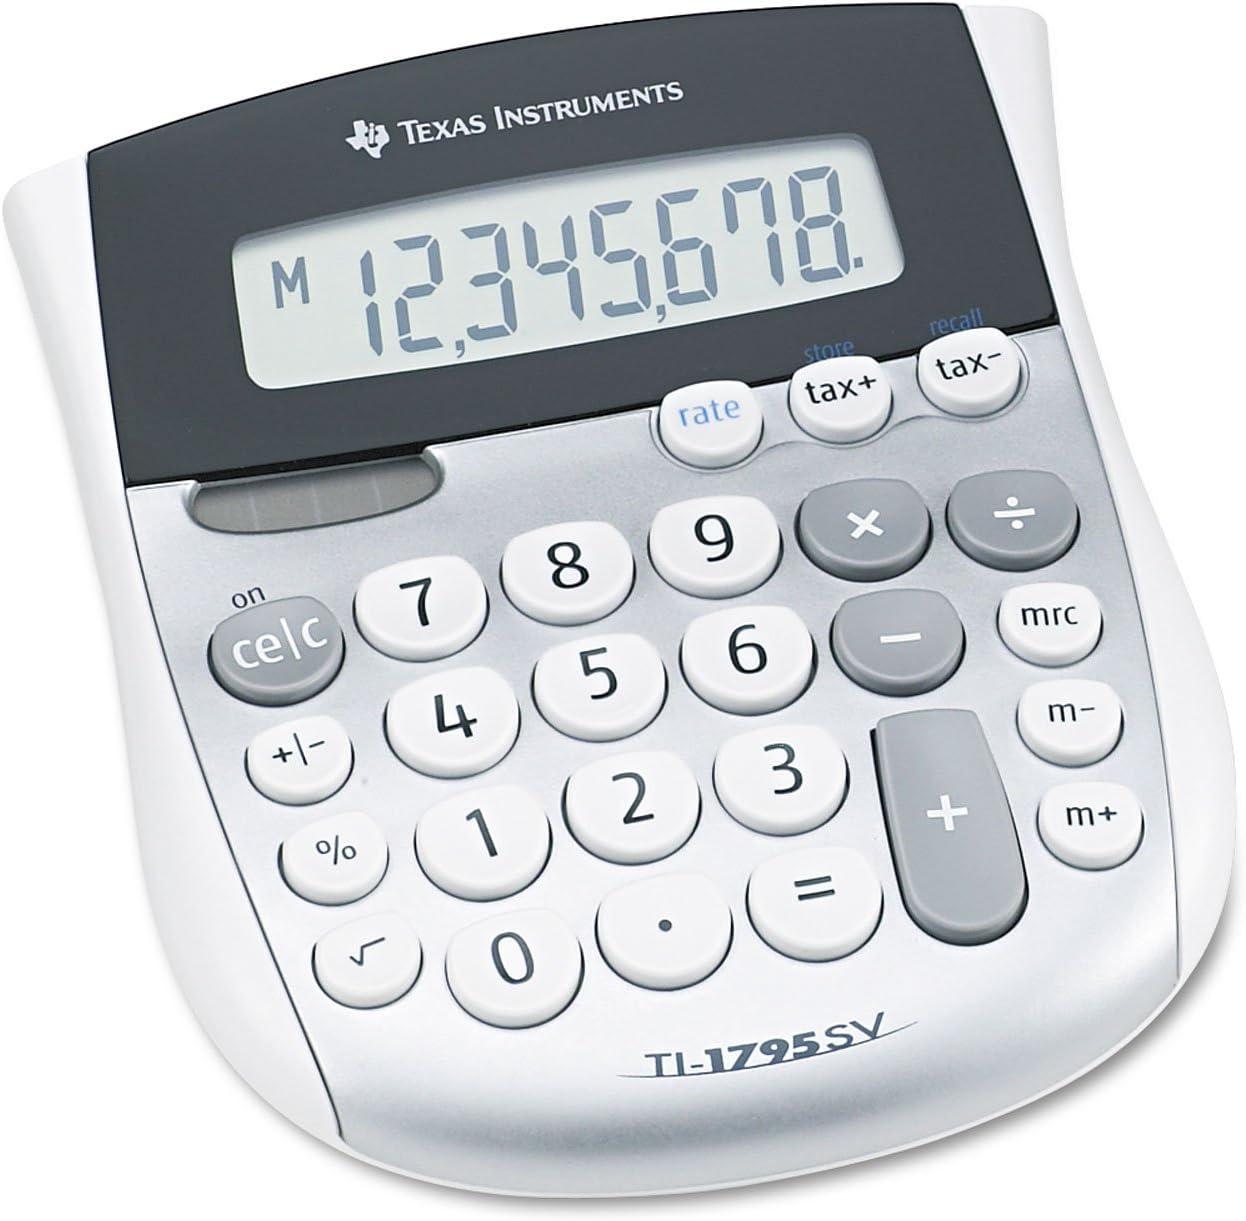 Texas Instruments TI-1795SV Minidesk Calculator